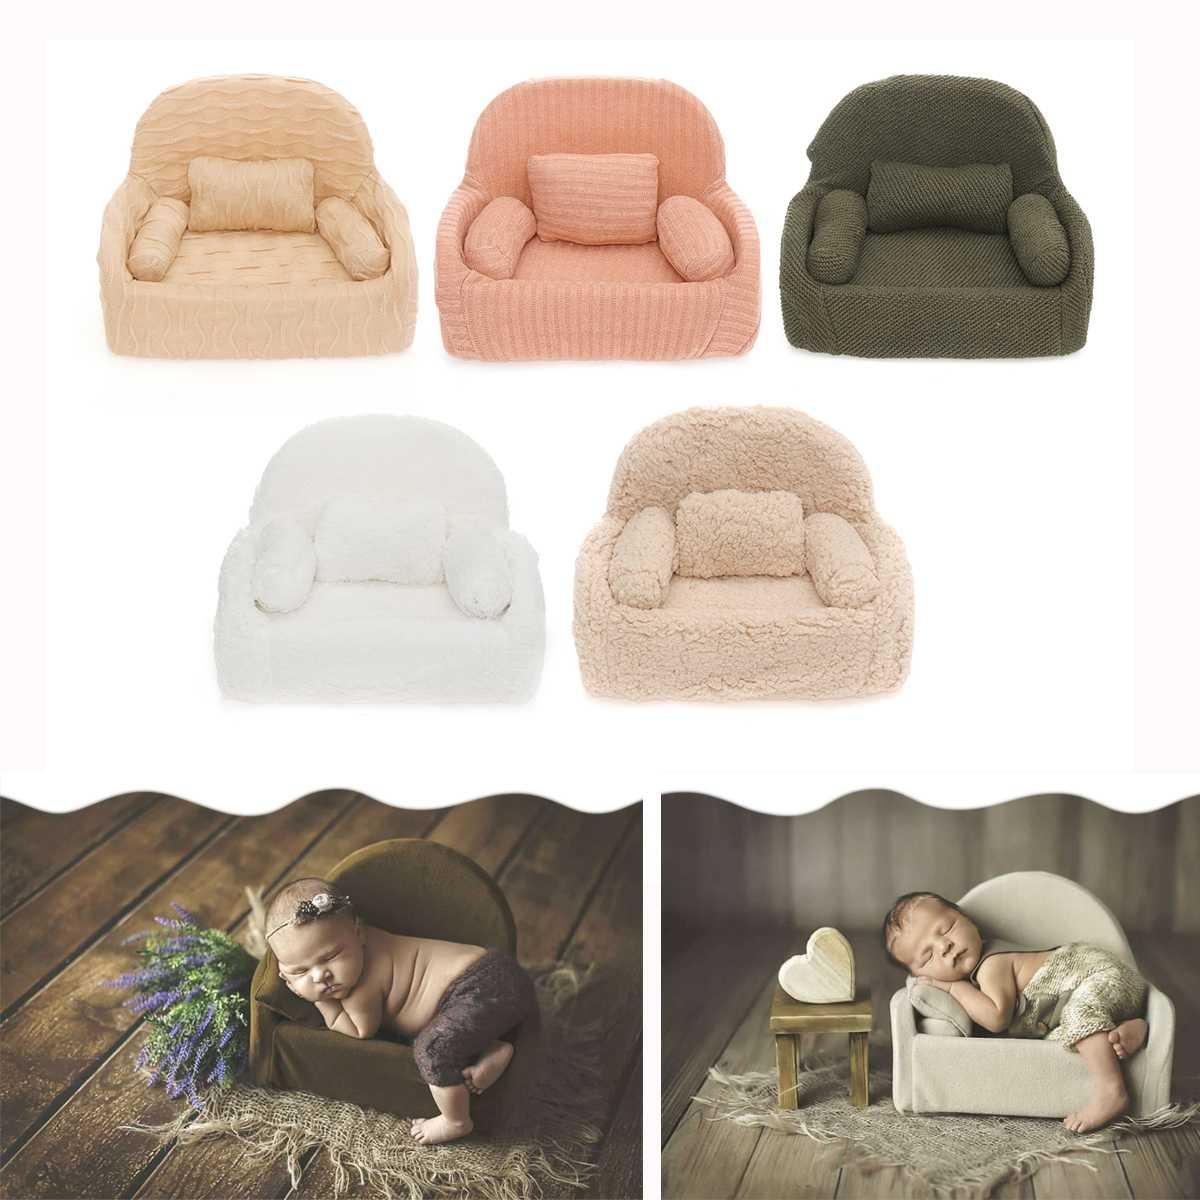 Chair-Decoration Sofa Shooting-Props Studio Posing Newborn-Baby Mini Fotografia-Accessories